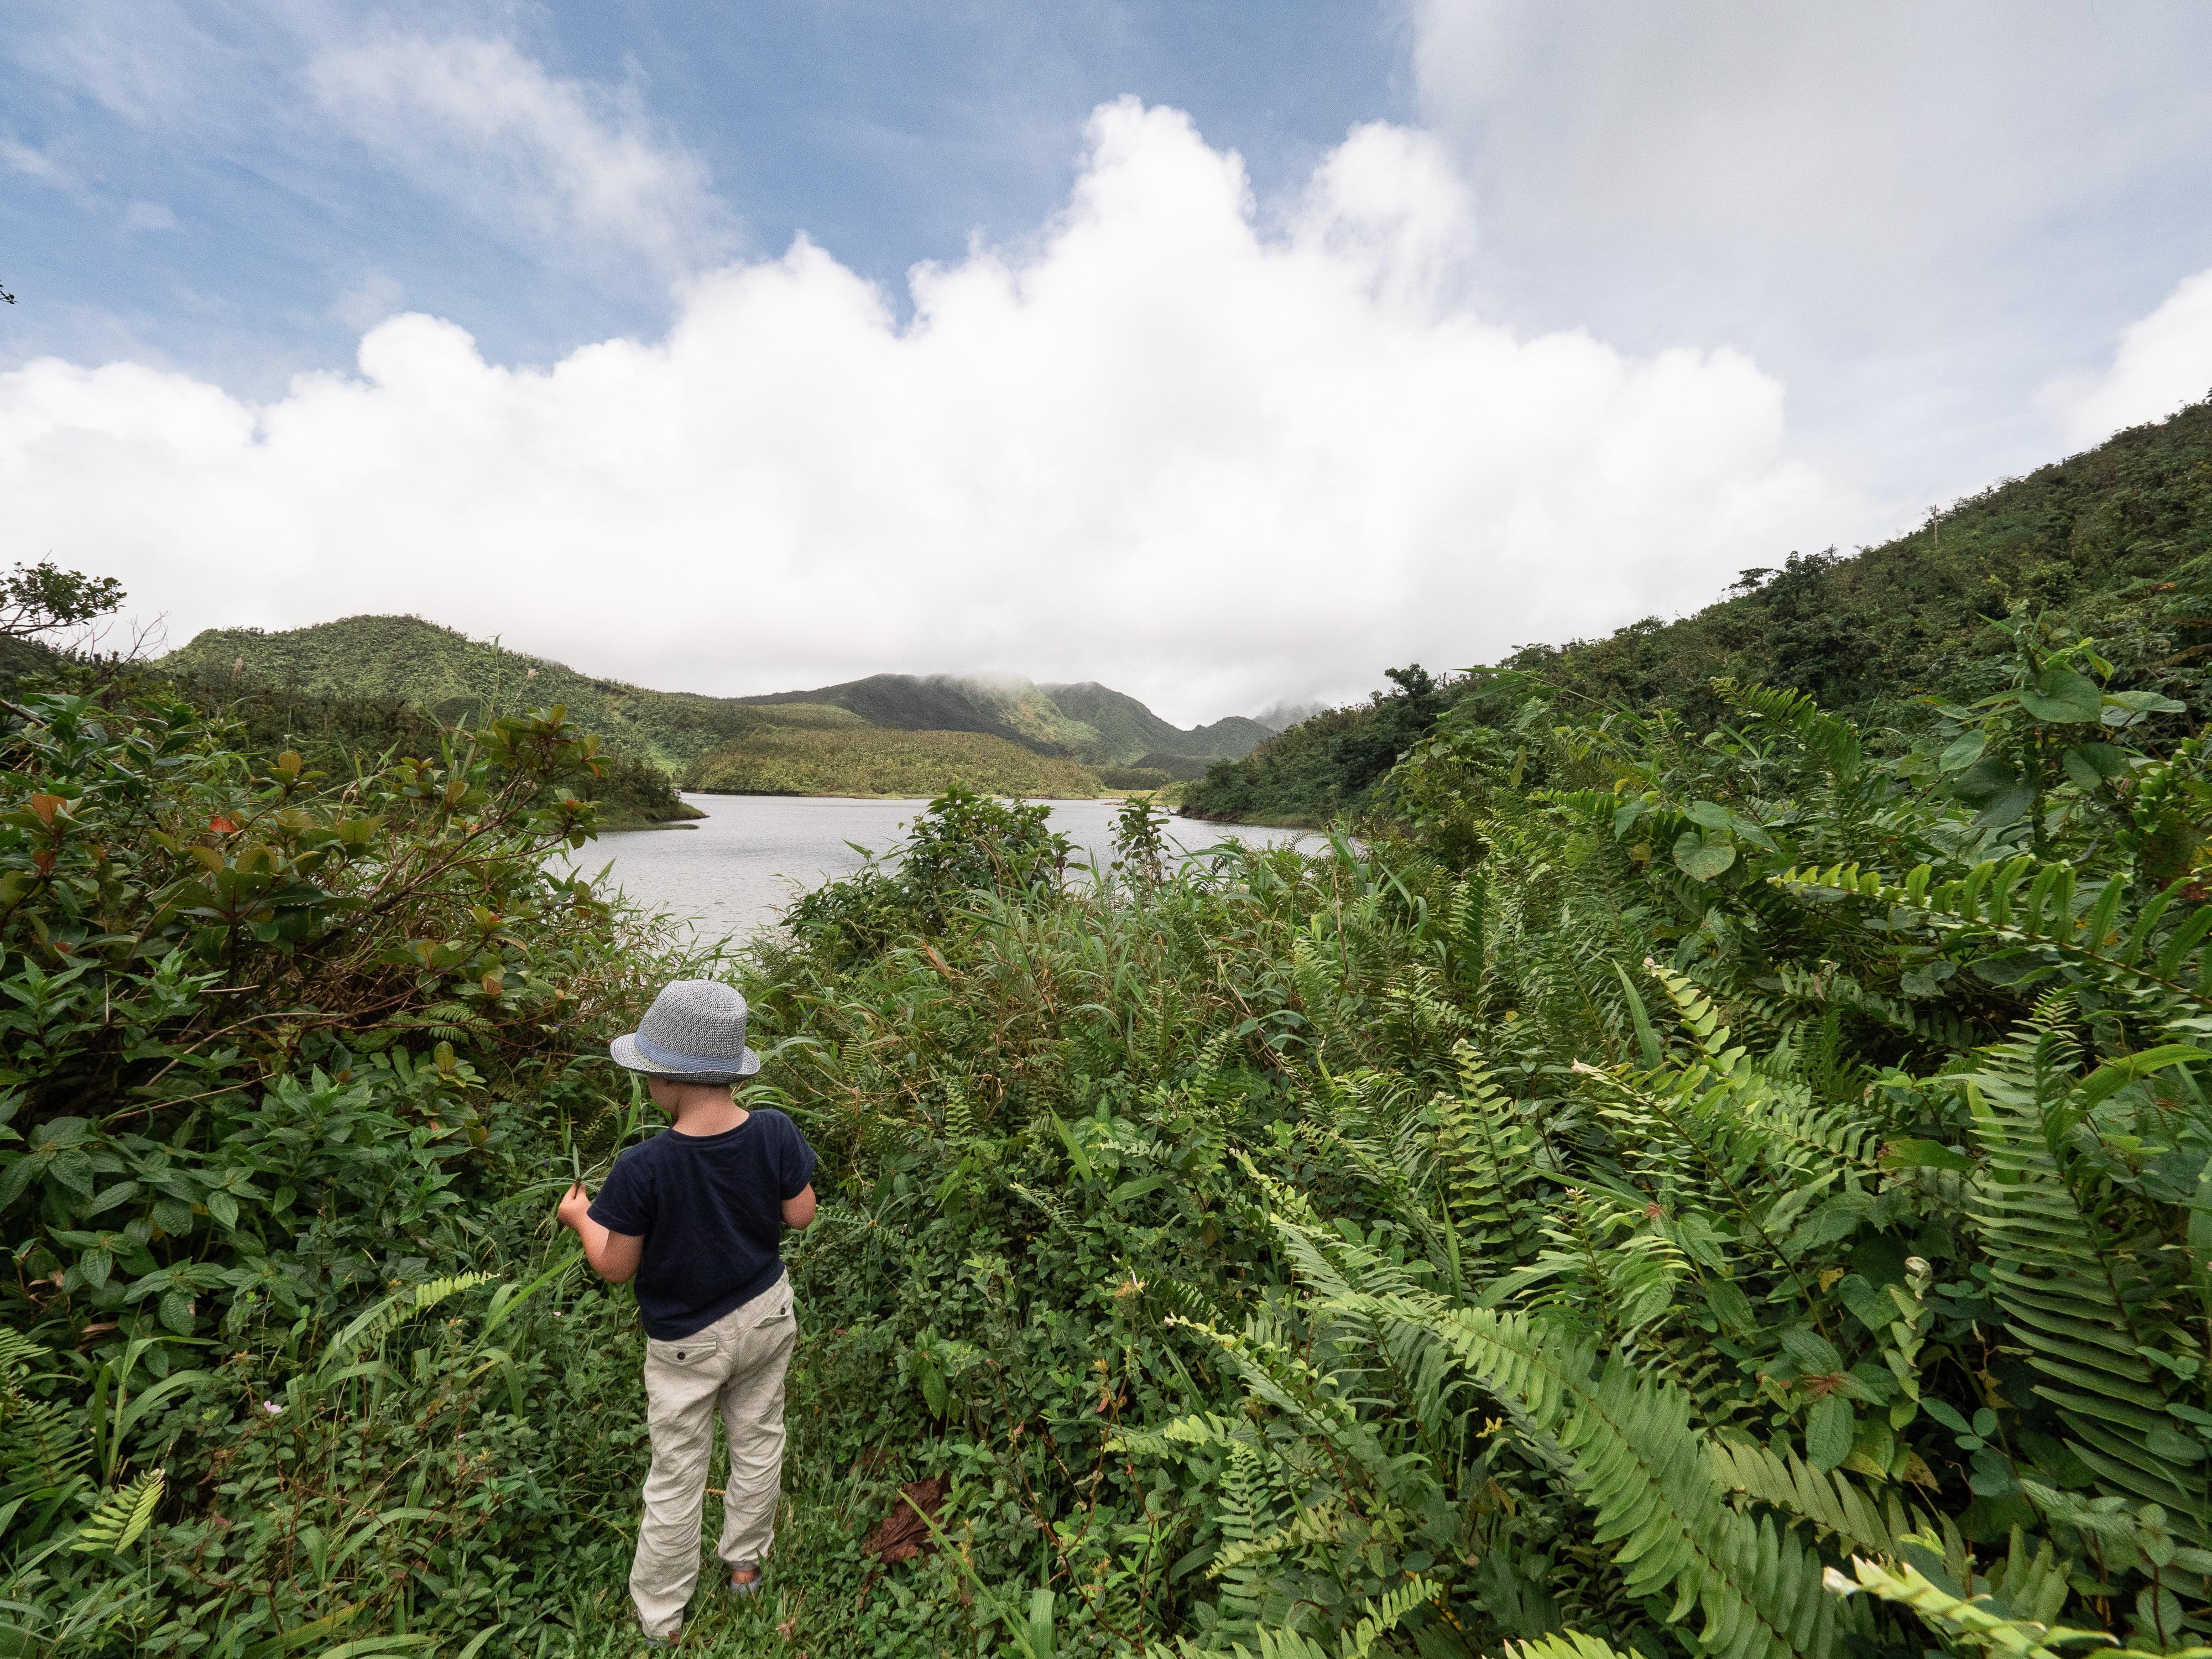 freshwater lake 52109 - Les globe blogueurs - blog voyage nature